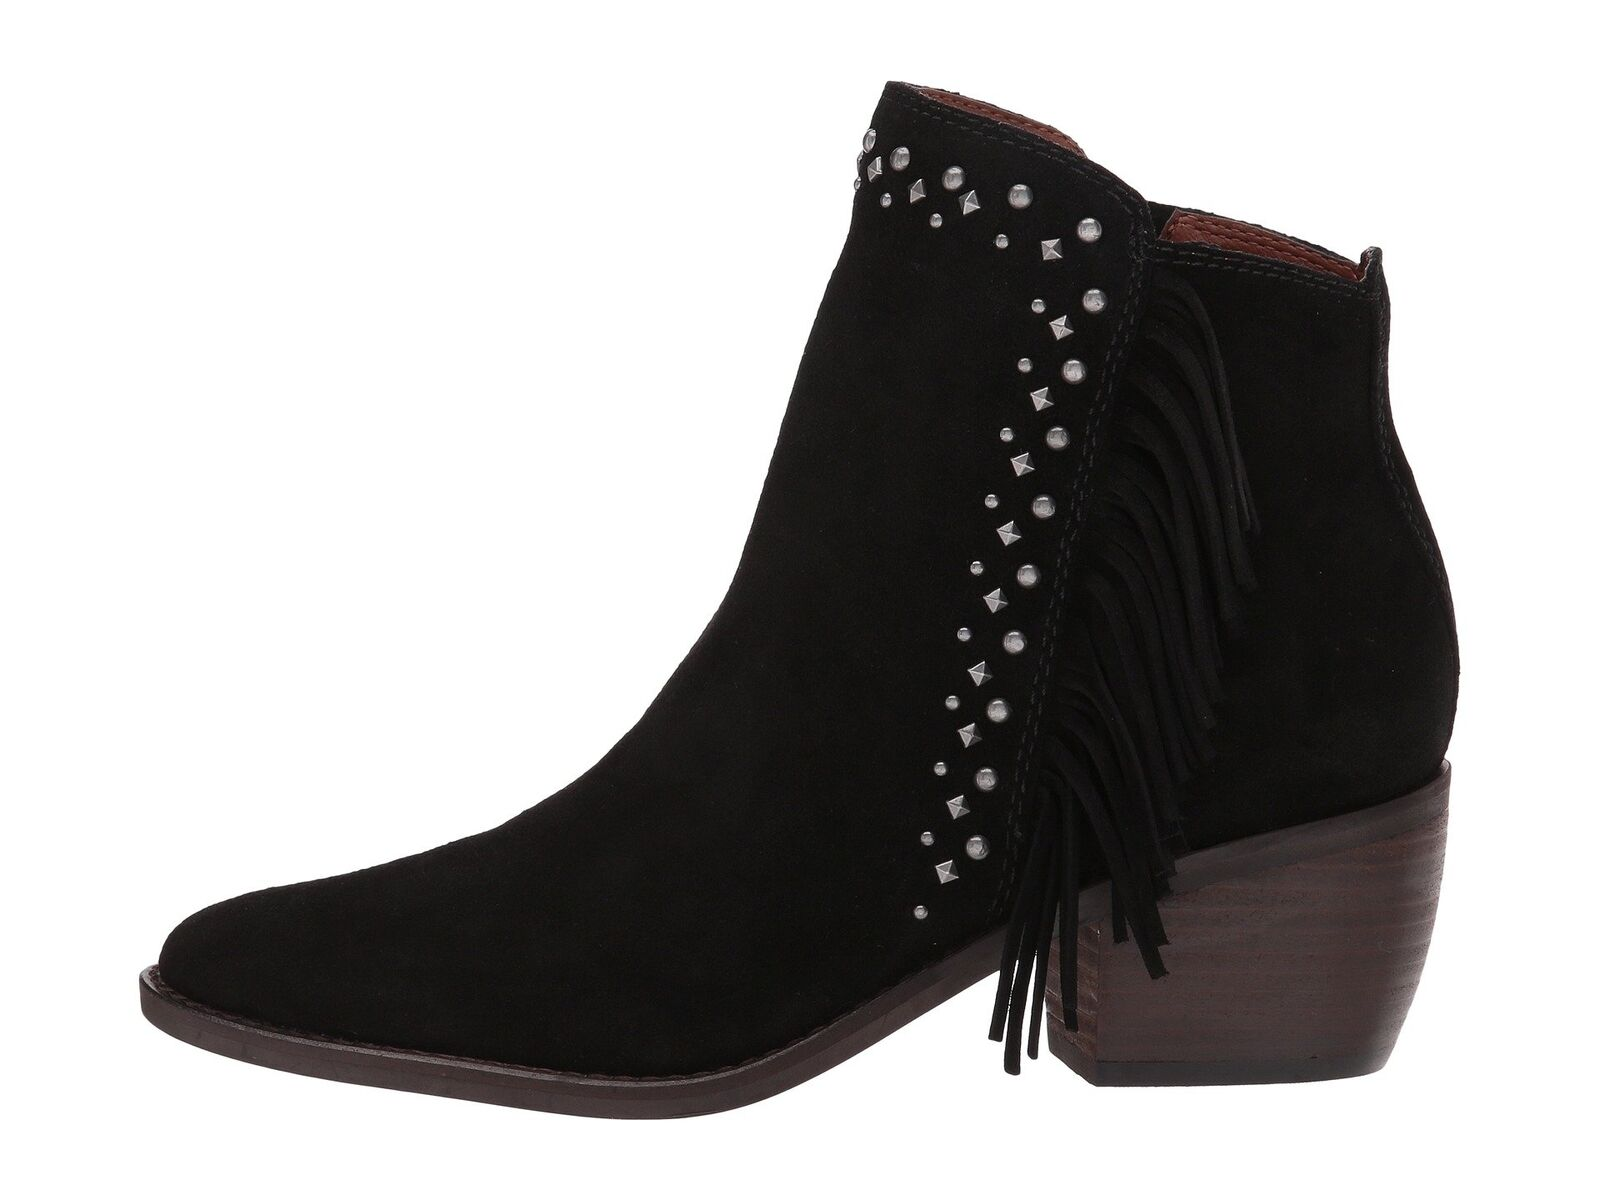 Lucky Women's LK-KAARFINA Fashion Boot BLACK OIL SUEDE